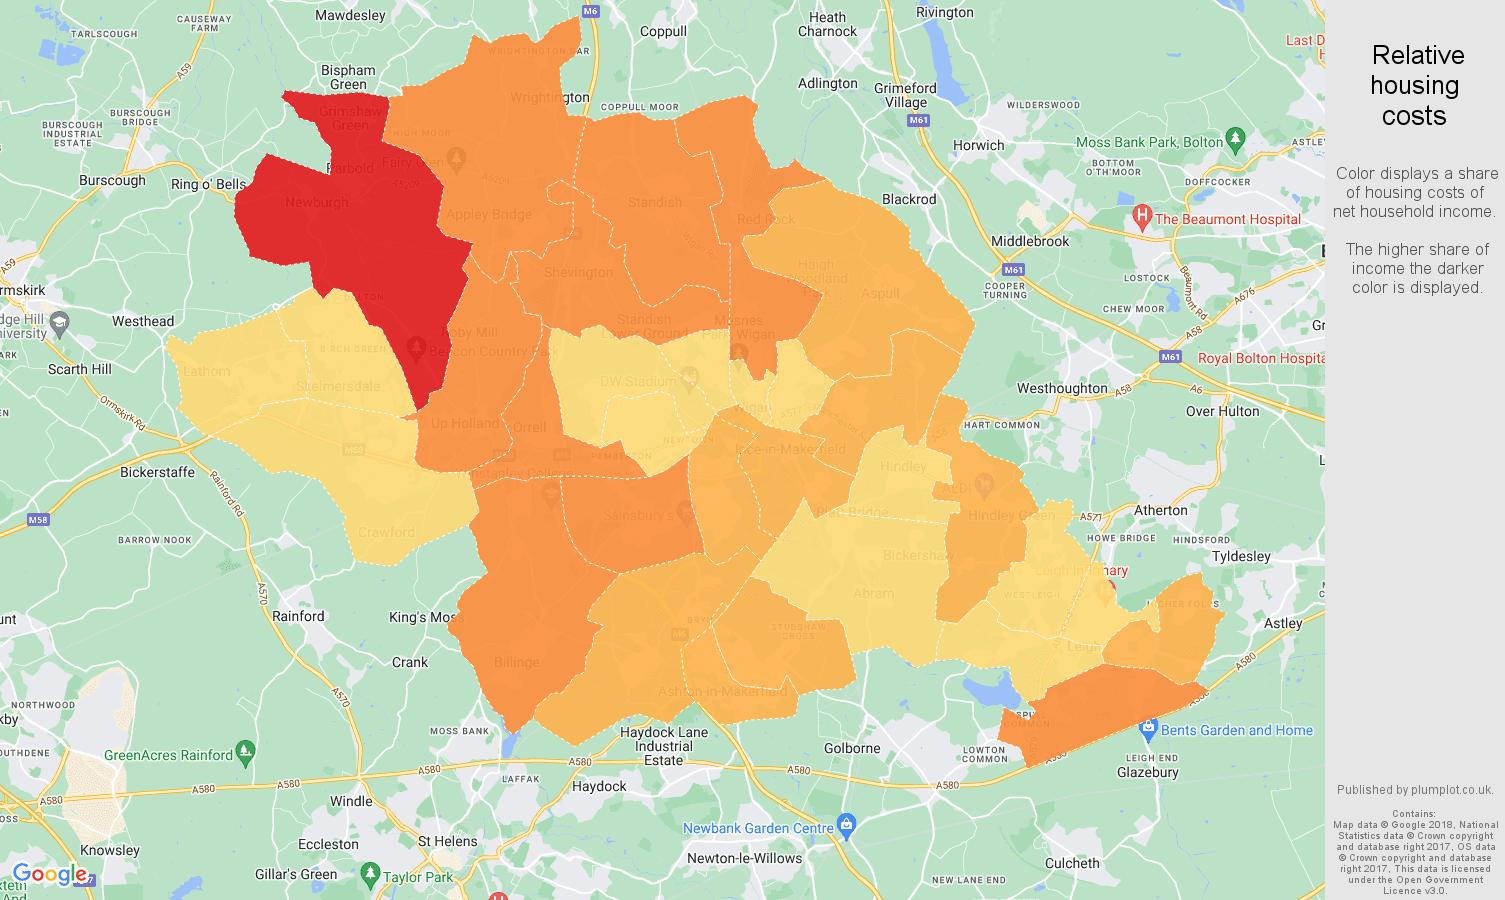 Wigan relative housing costs map